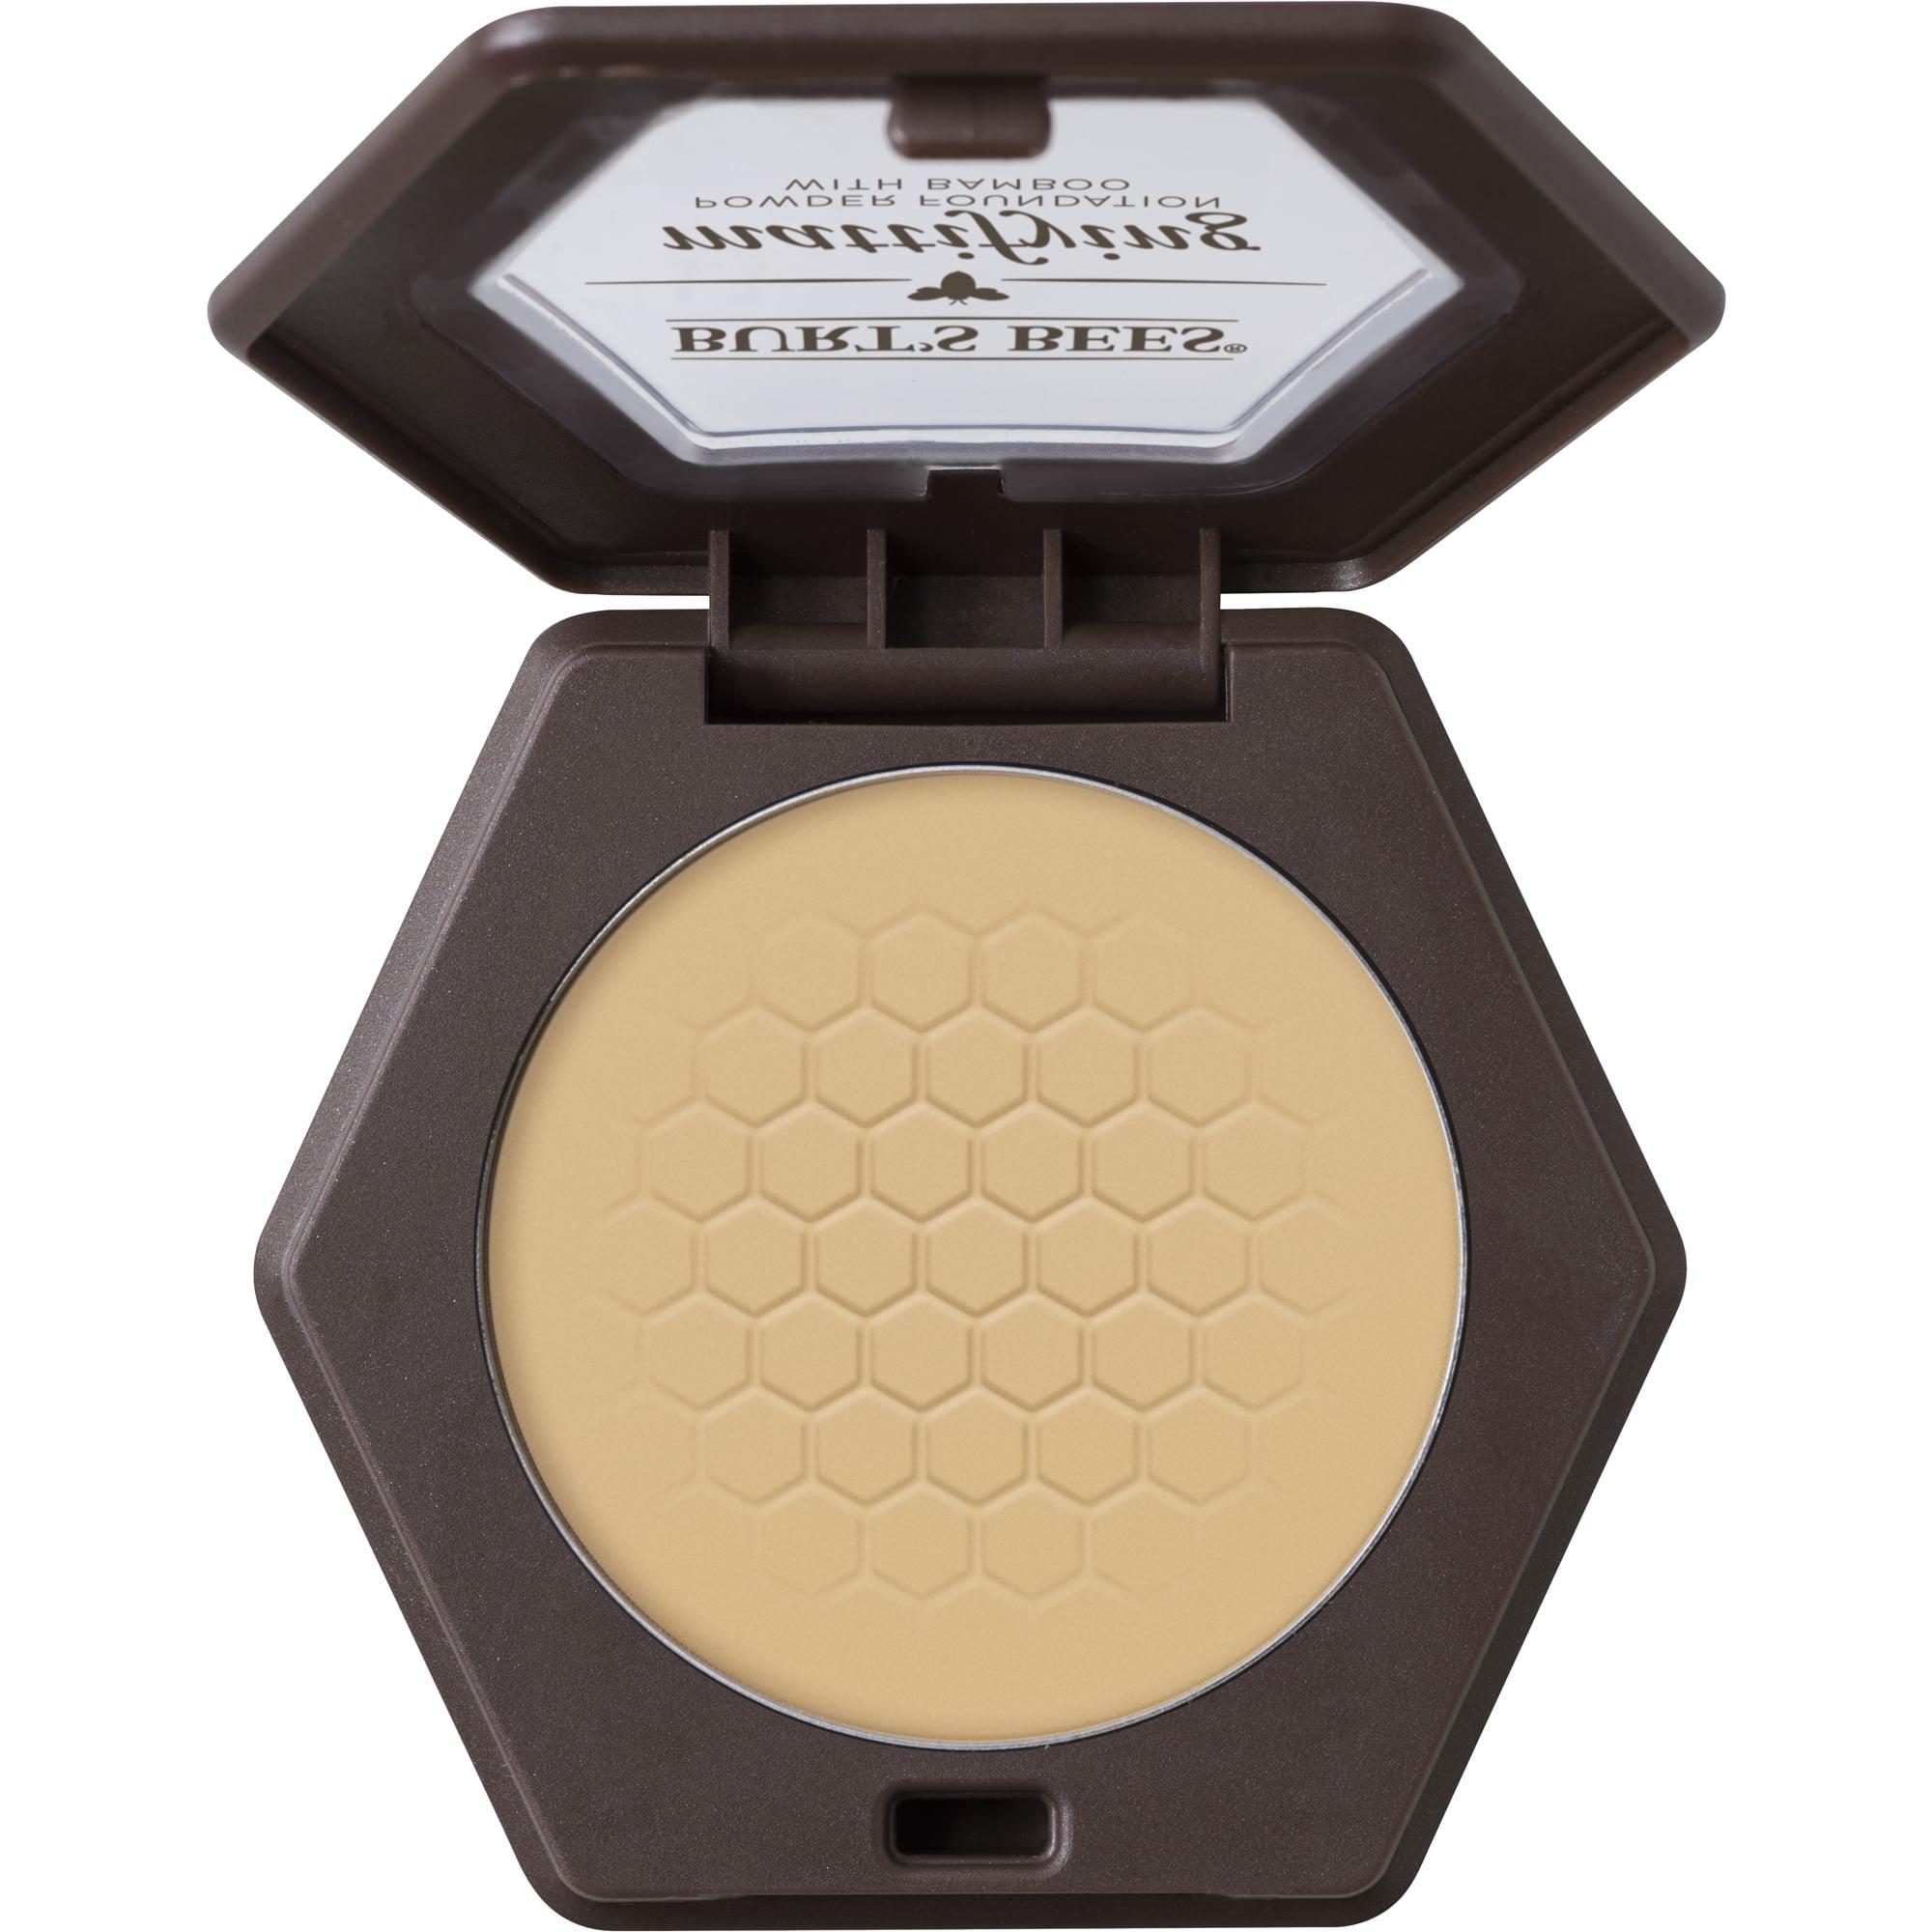 Burt's Bees 100% Natural Mattifying Powder Foundation, Sand, 0.3 oz